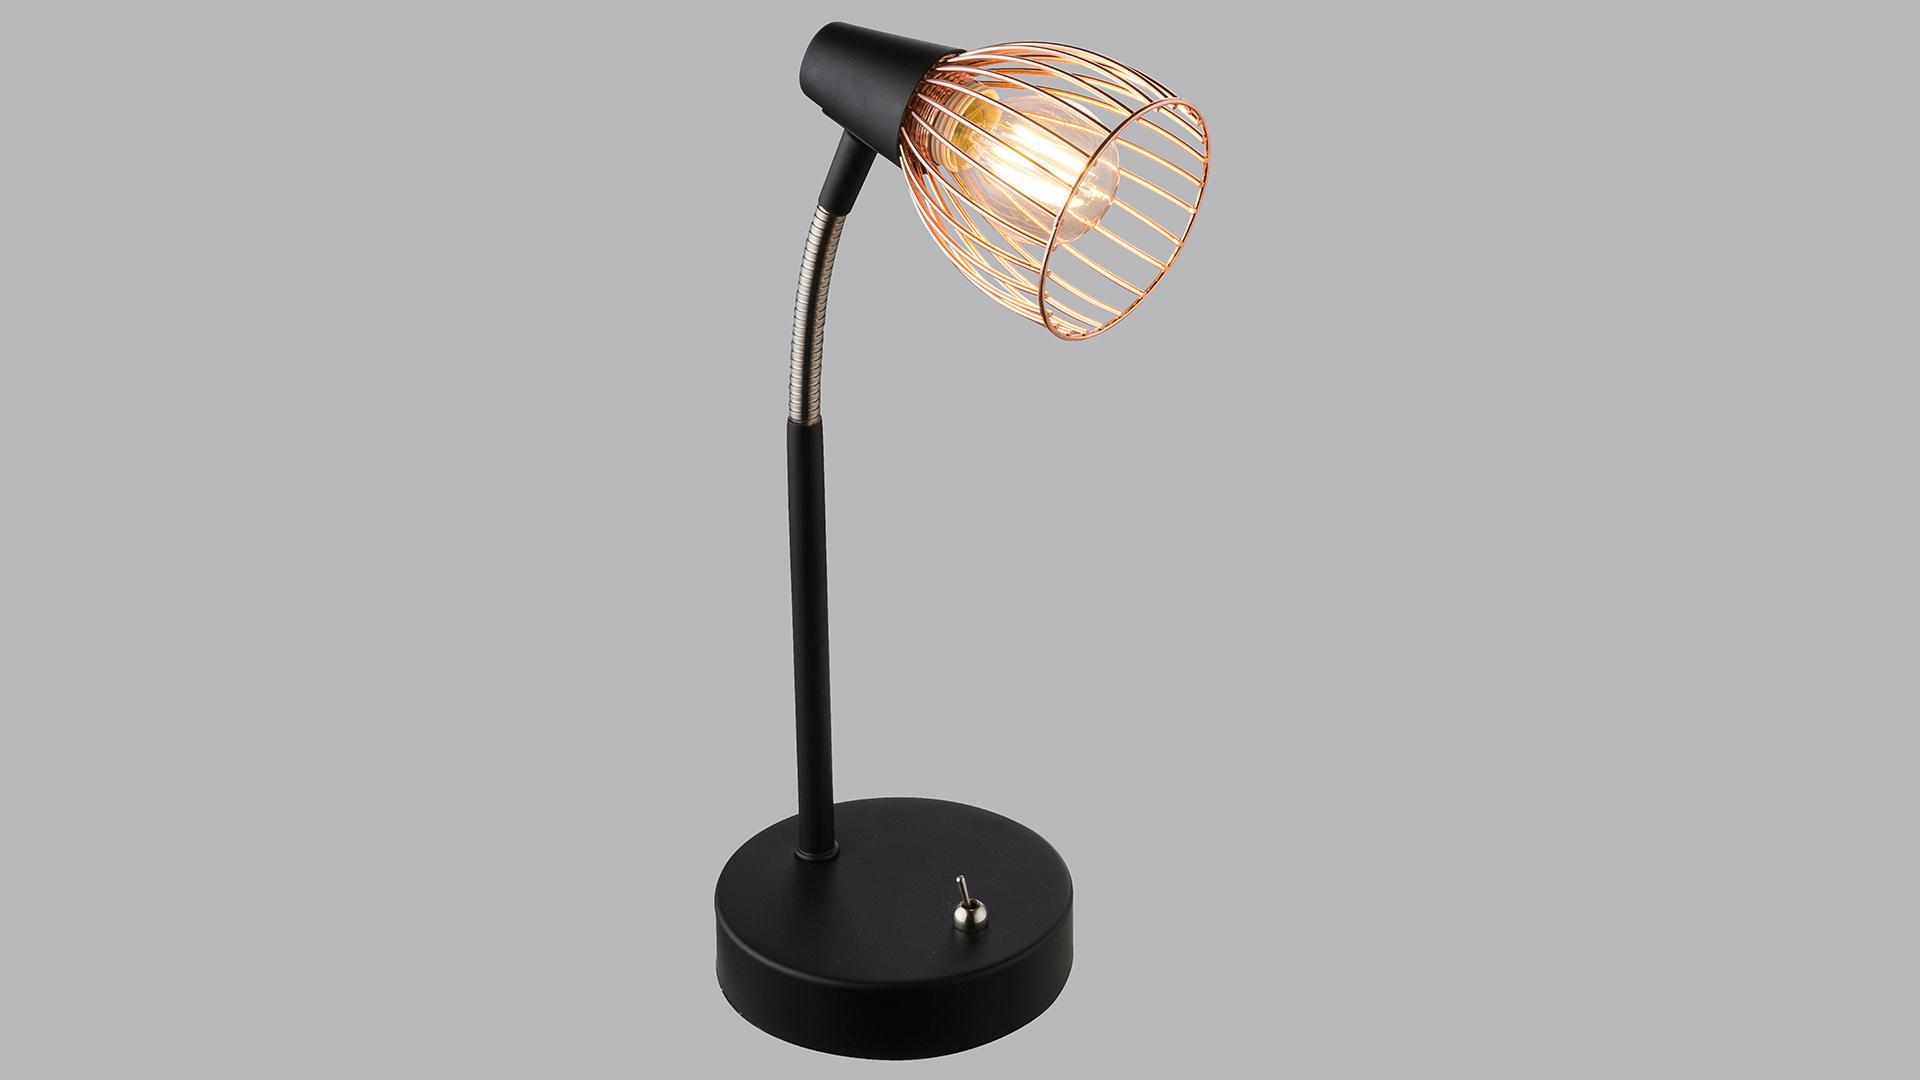 Лампа настольная Rivoli Insolito t1 cp